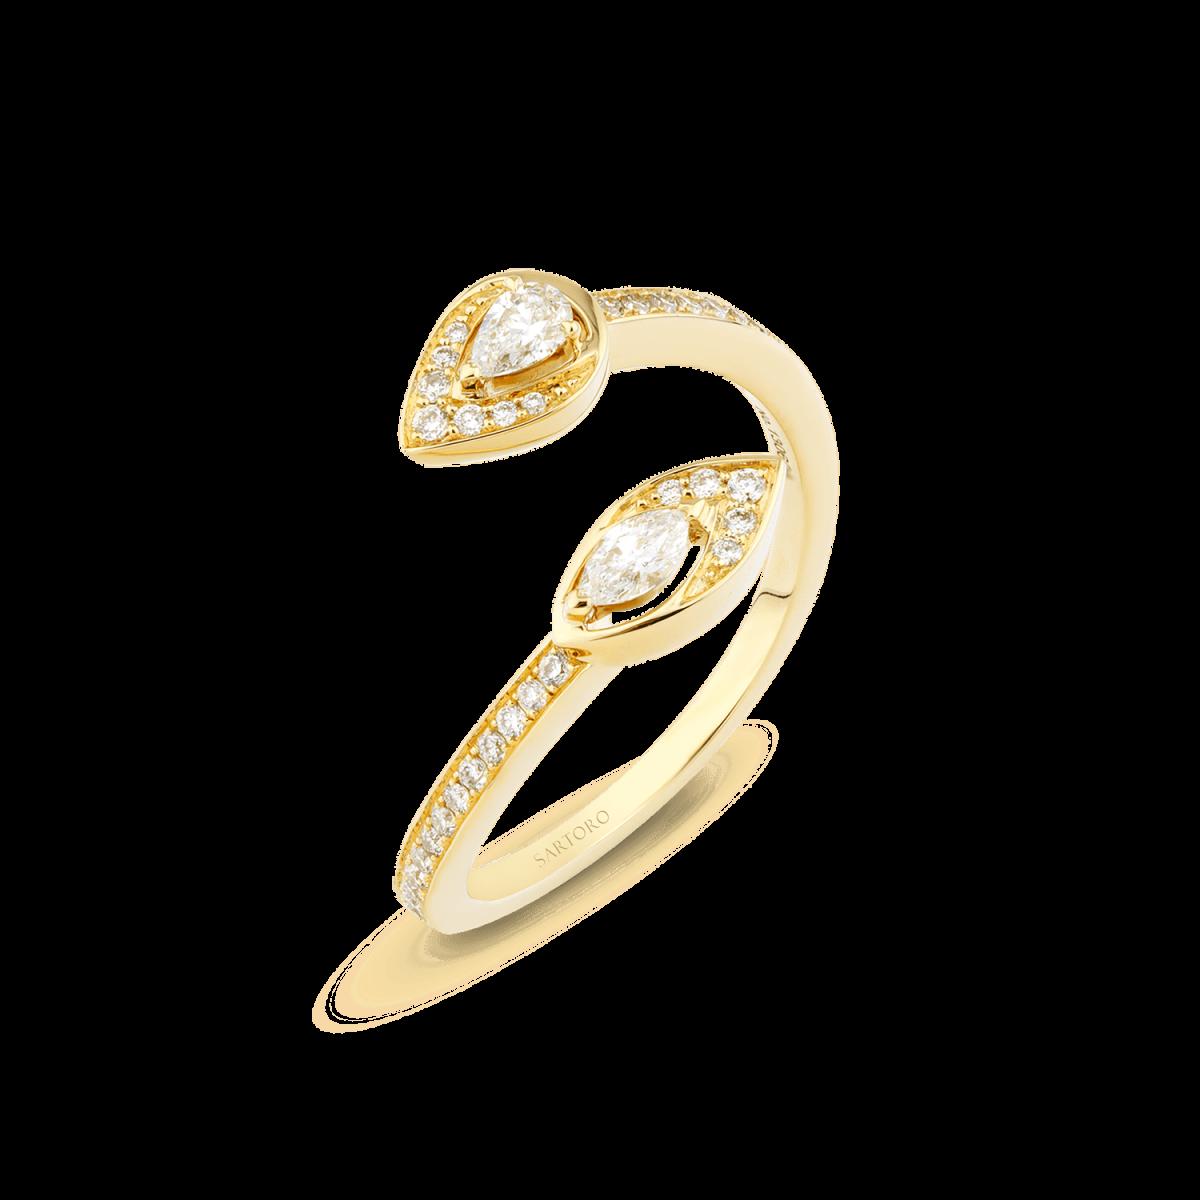 Dolce Forever Ring